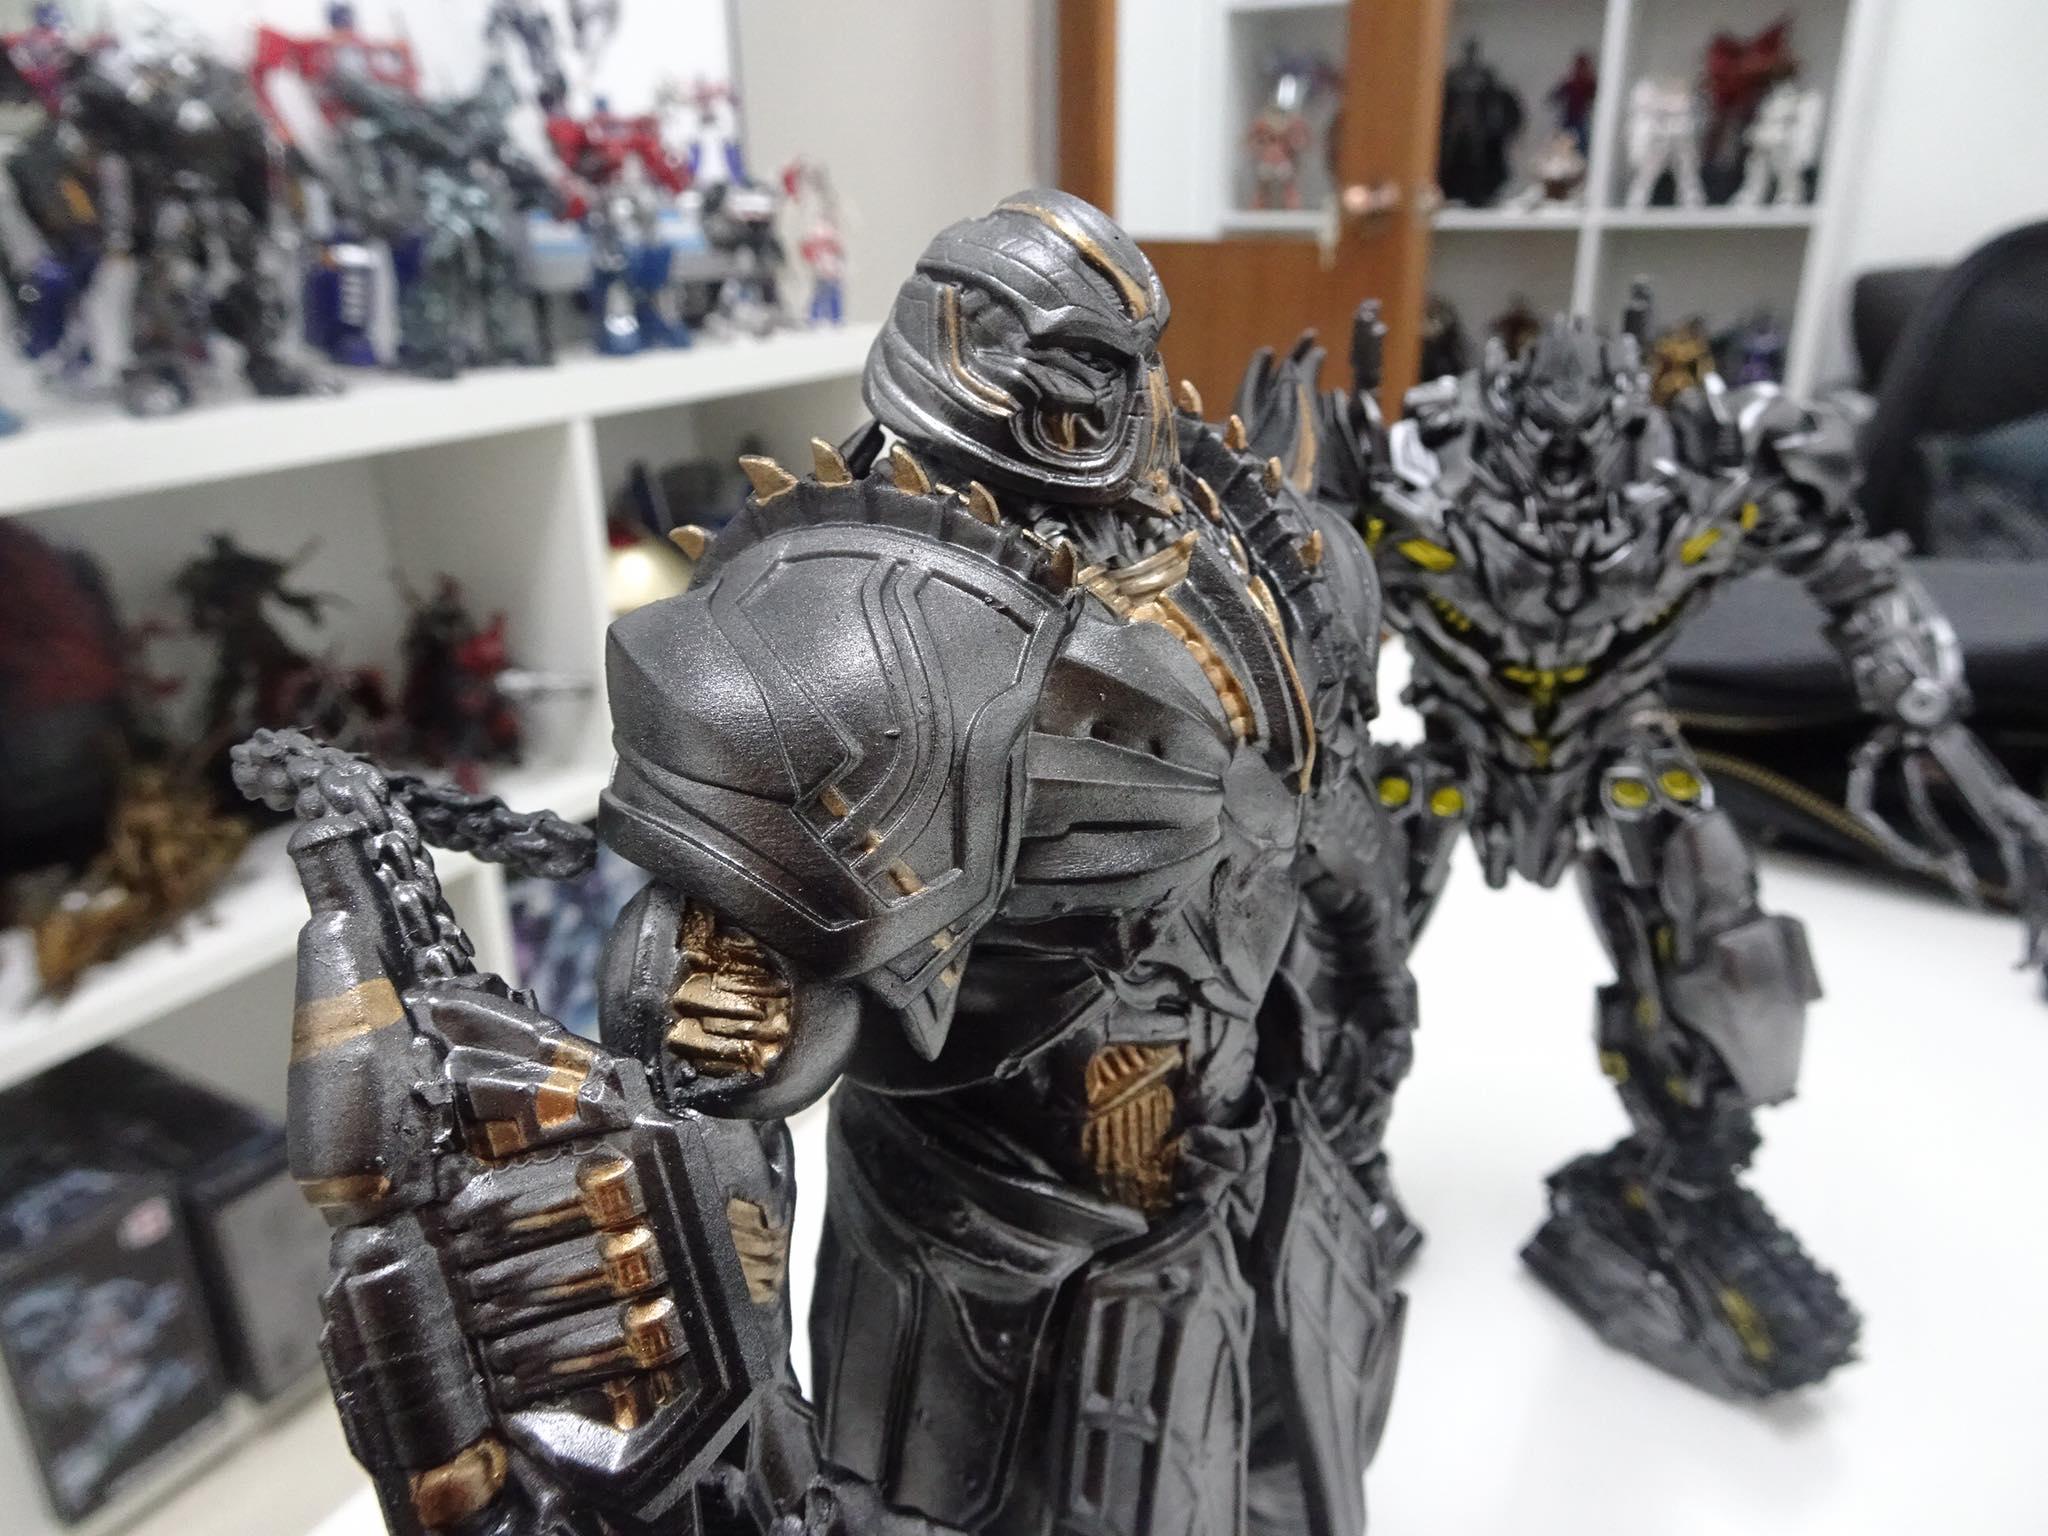 Megatron 3D Printing Figurine